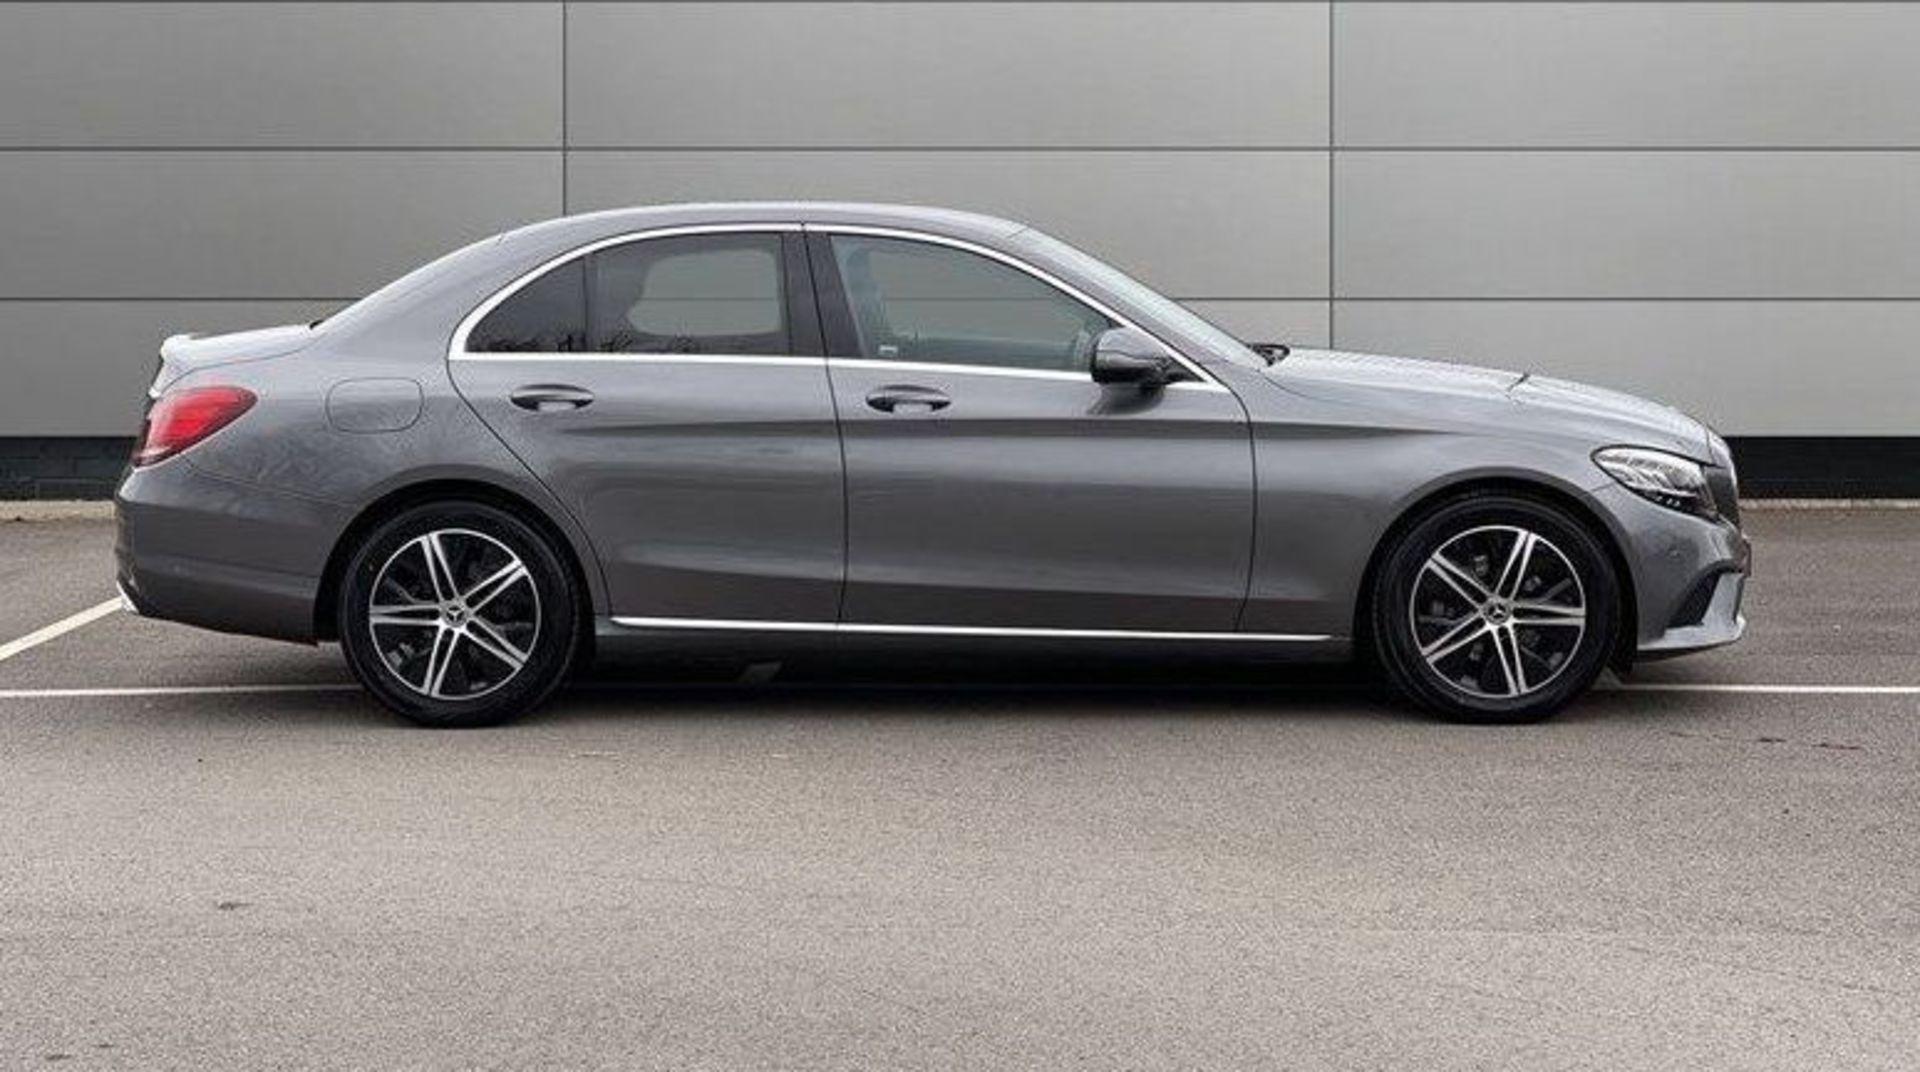 (Reserve Met) Mercedes C220d Sport - 9G Tronic Auto - 188BHP - 2019 Reg - Reversing Cam - Sat Nav - - Image 3 of 7